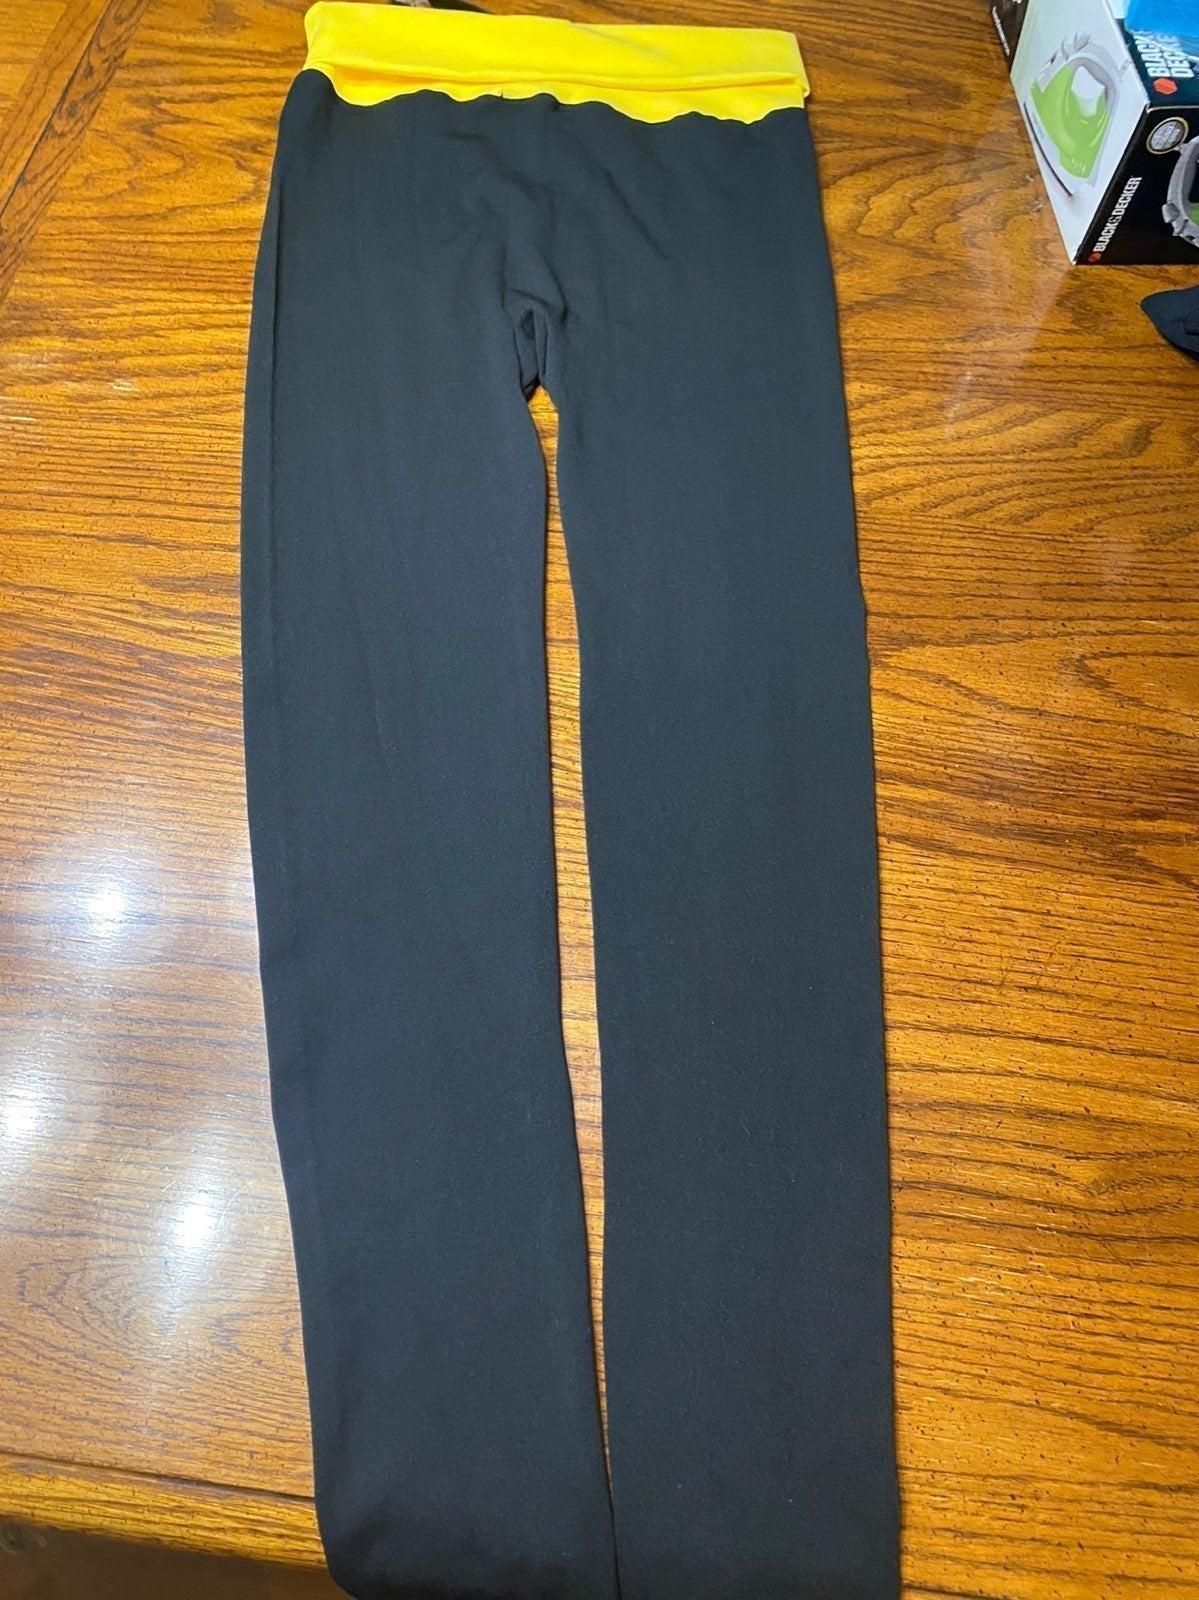 Riv Yoga Pants